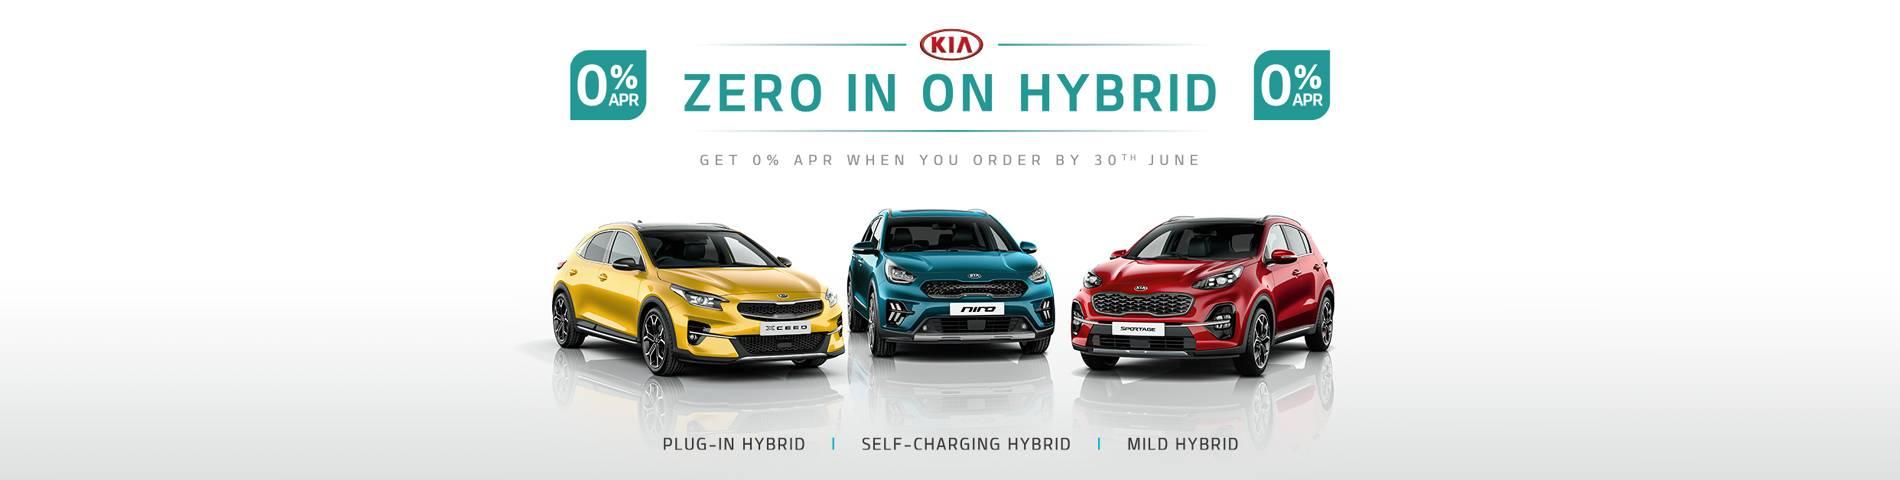 Kia Hybrid Zero Representative